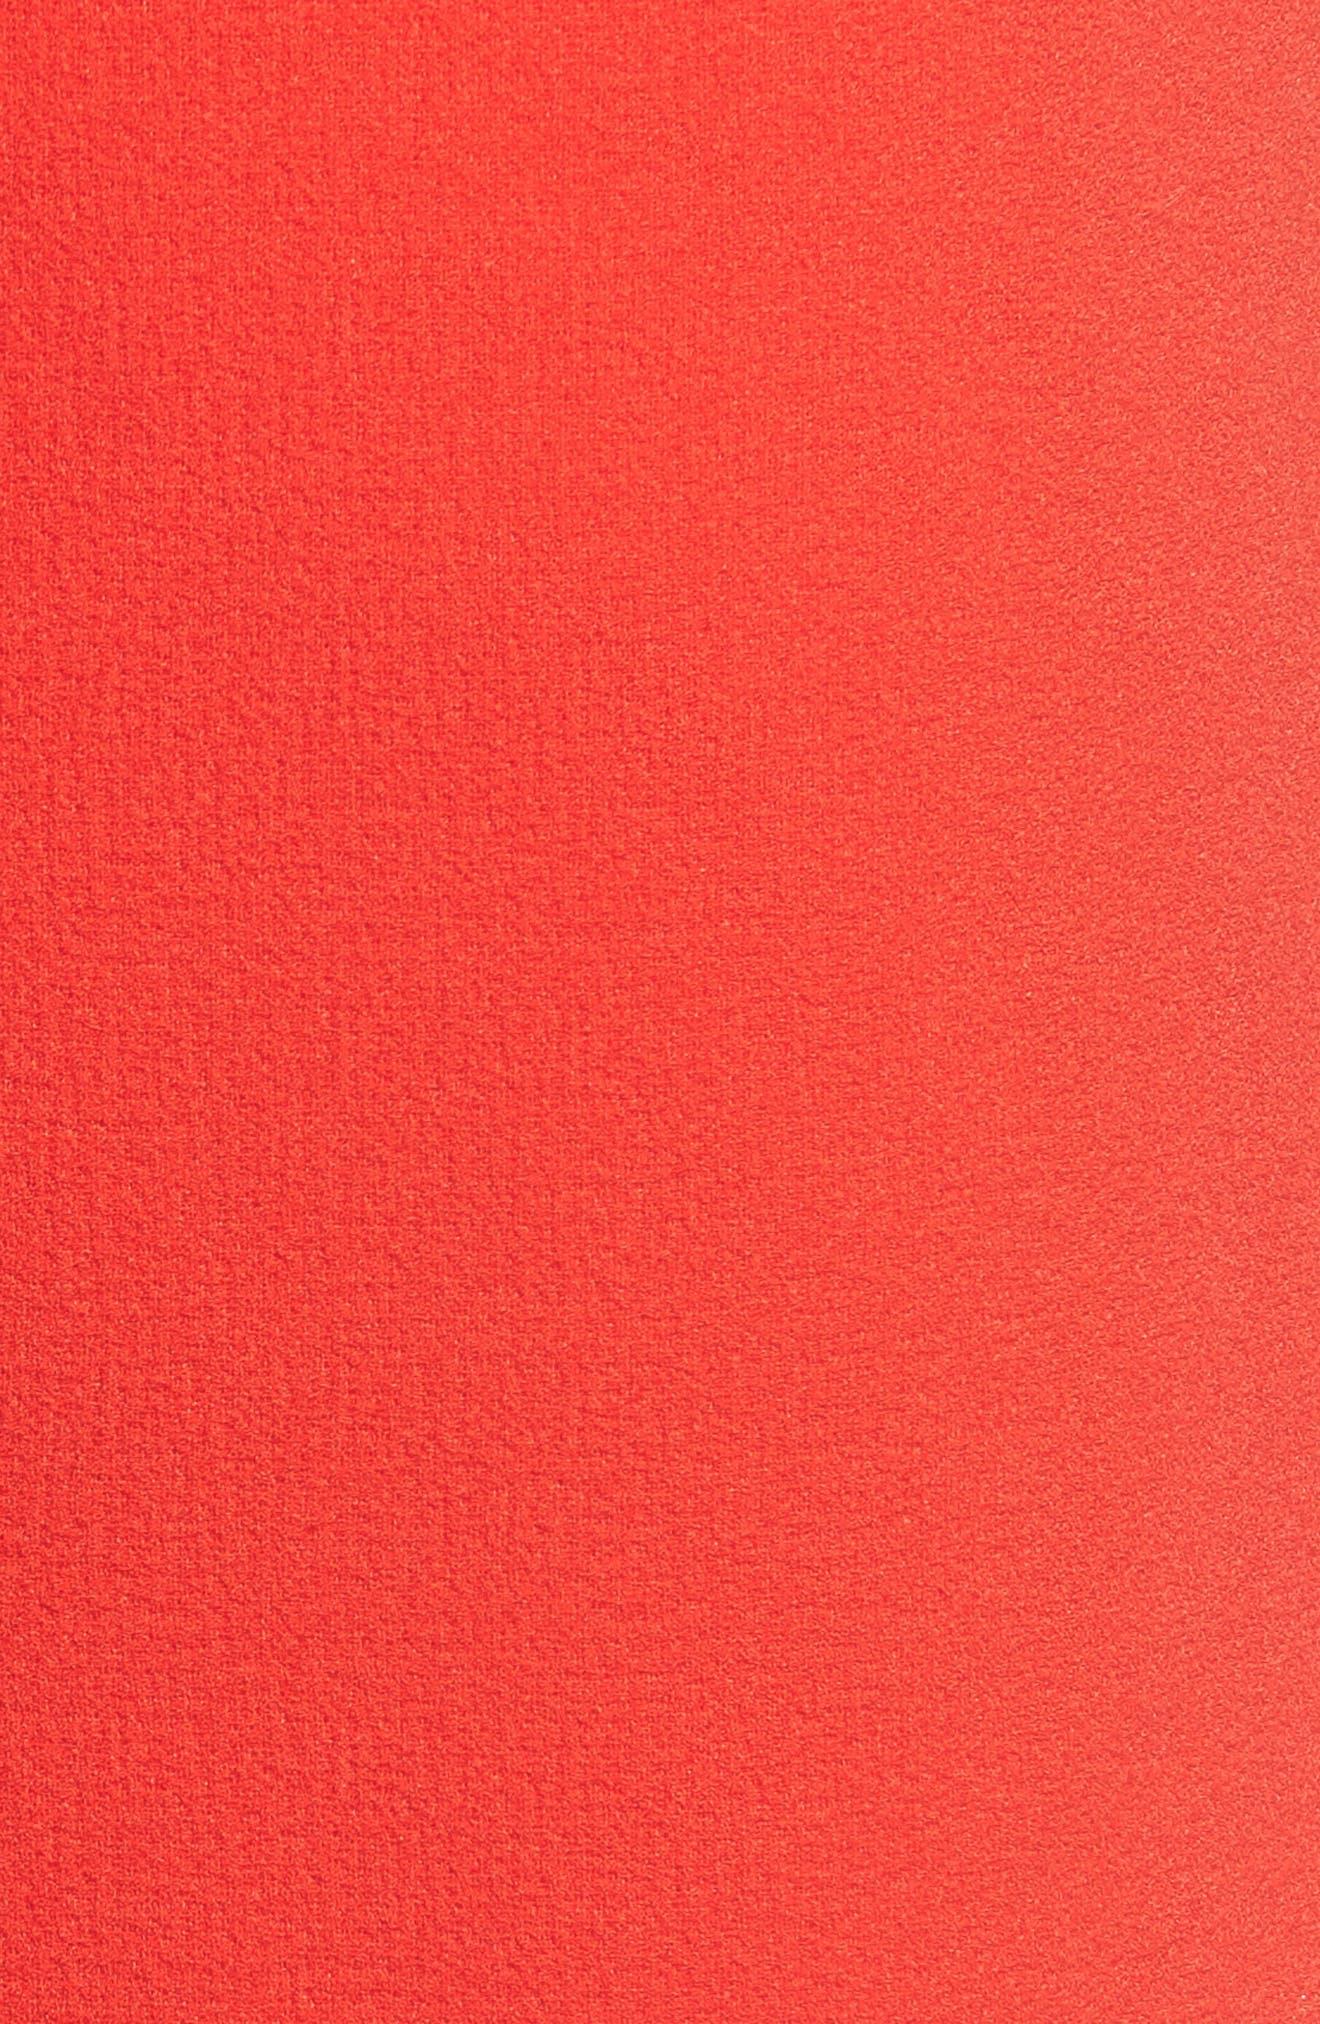 Hailey Crepe Dress,                             Alternate thumbnail 131, color,